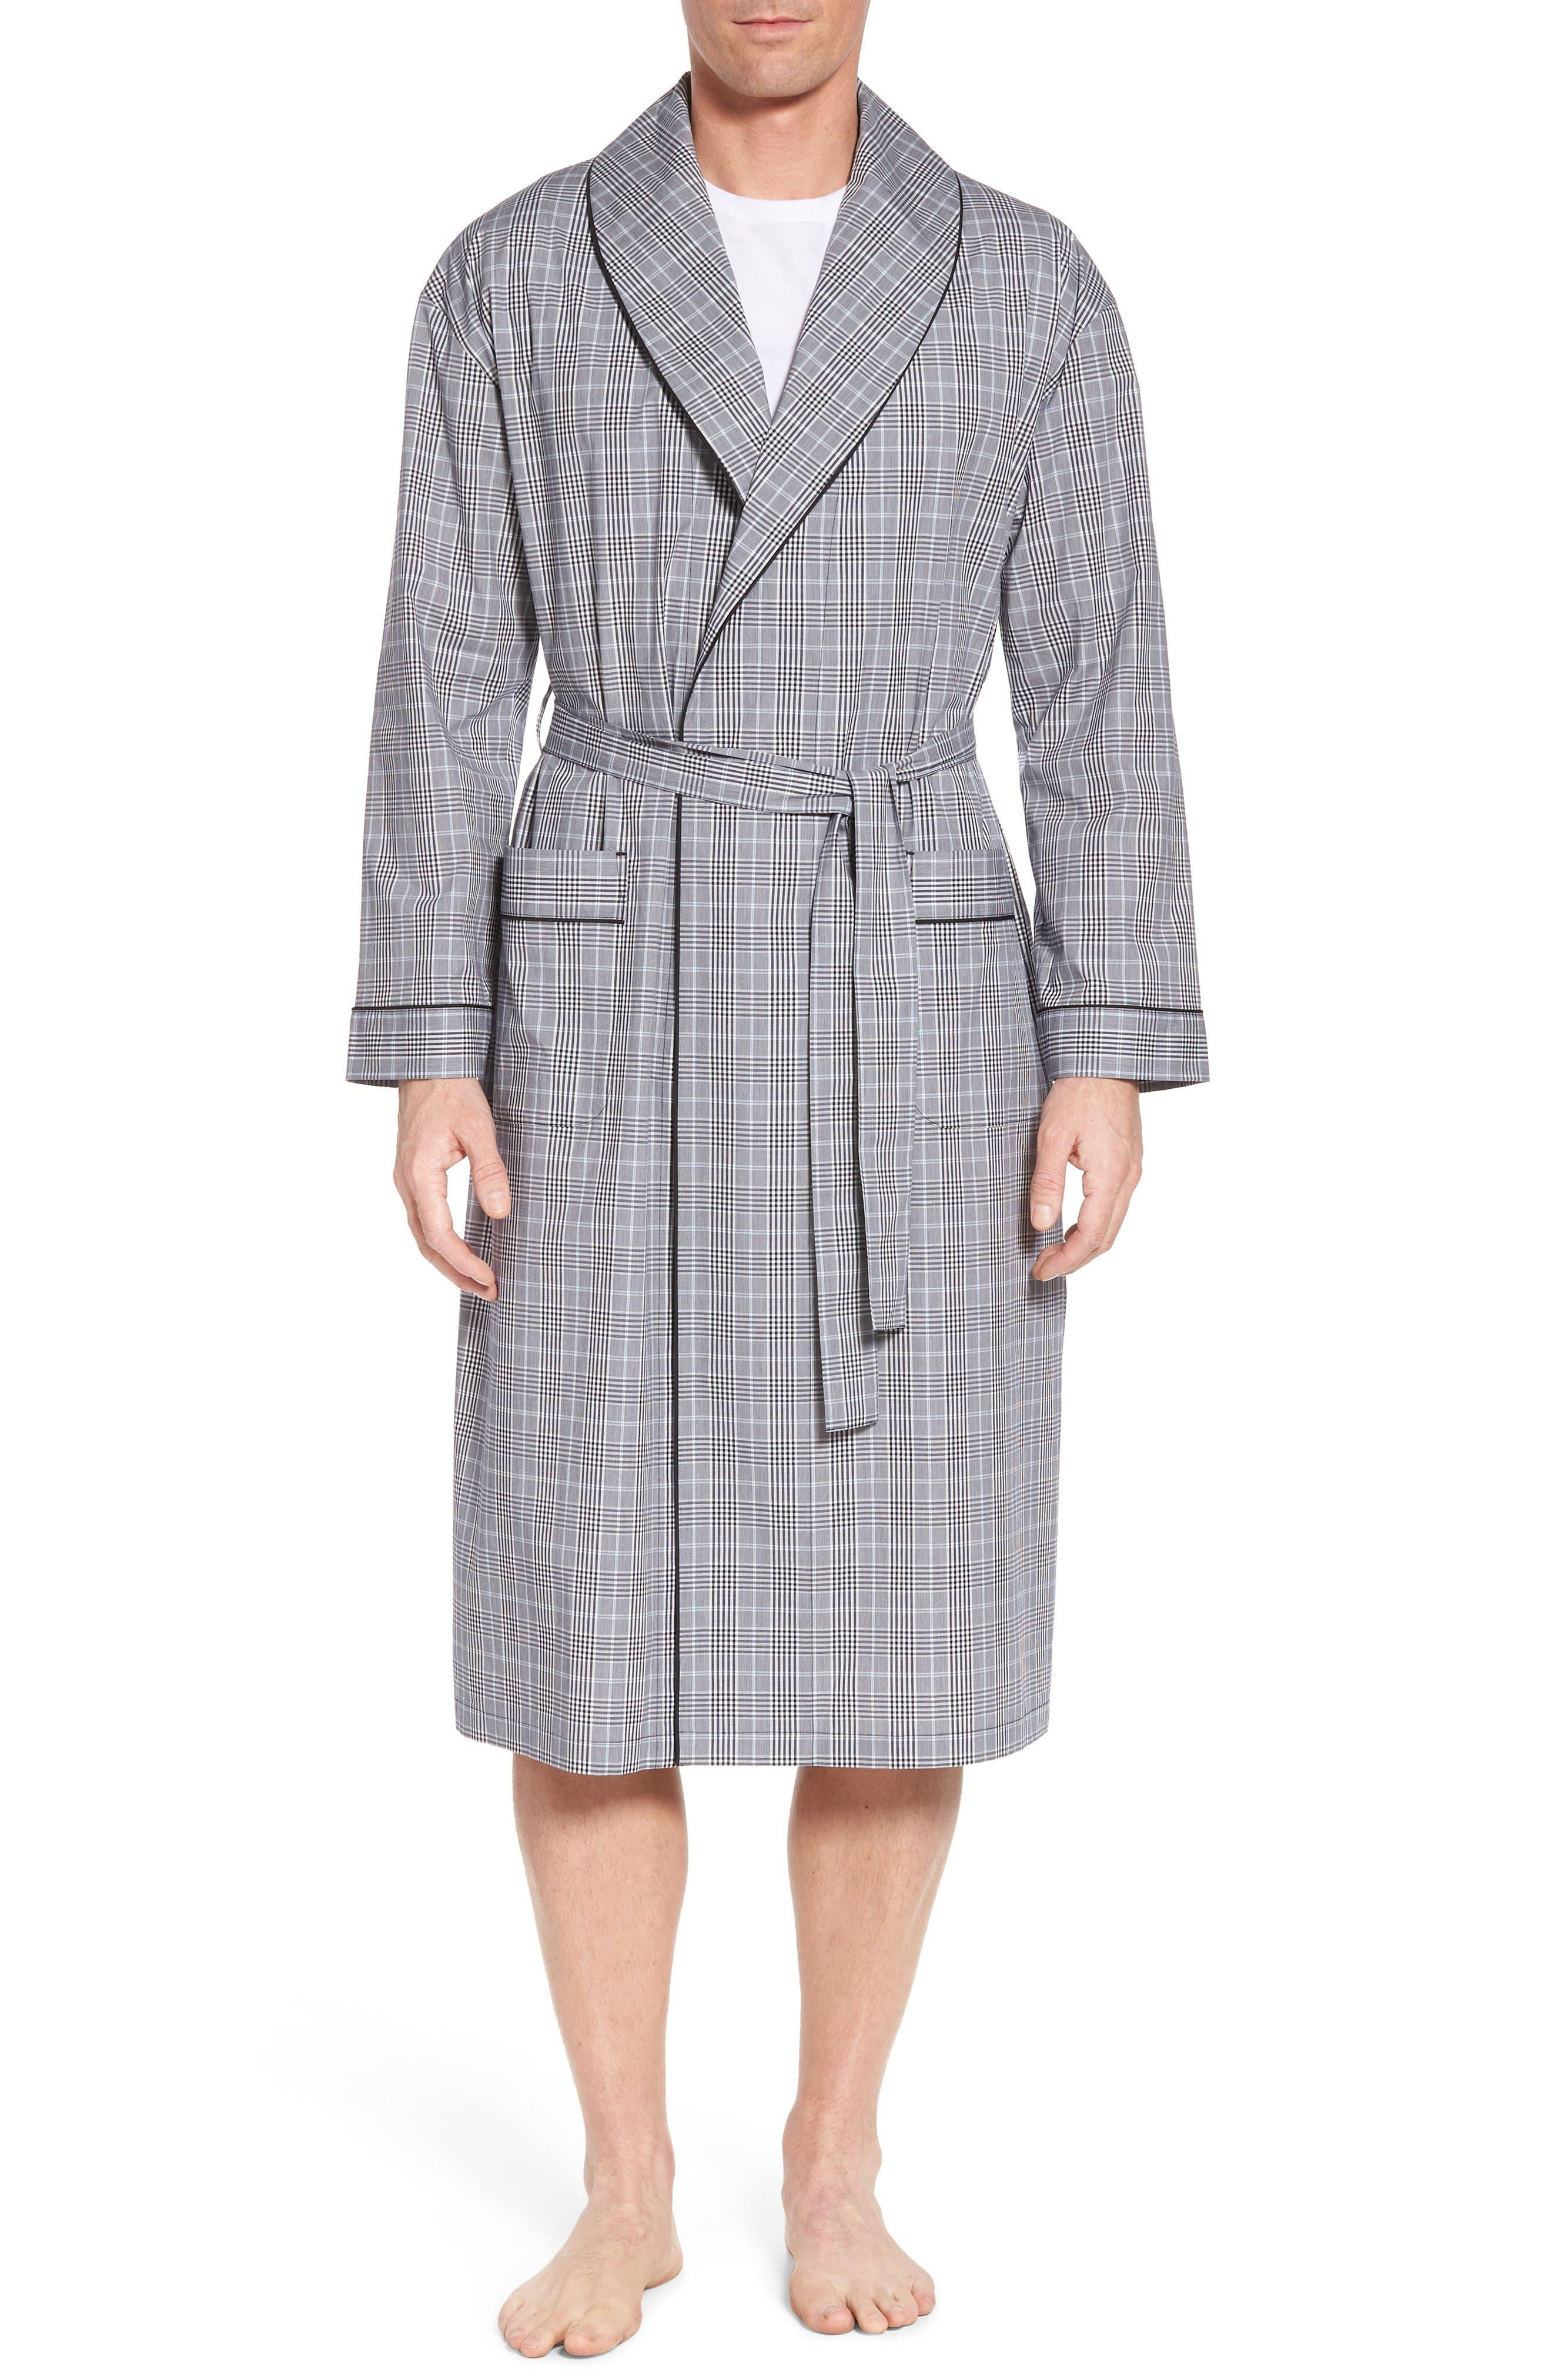 Charleston Robe,                             Main thumbnail 1, color,                             BLACK PLAID